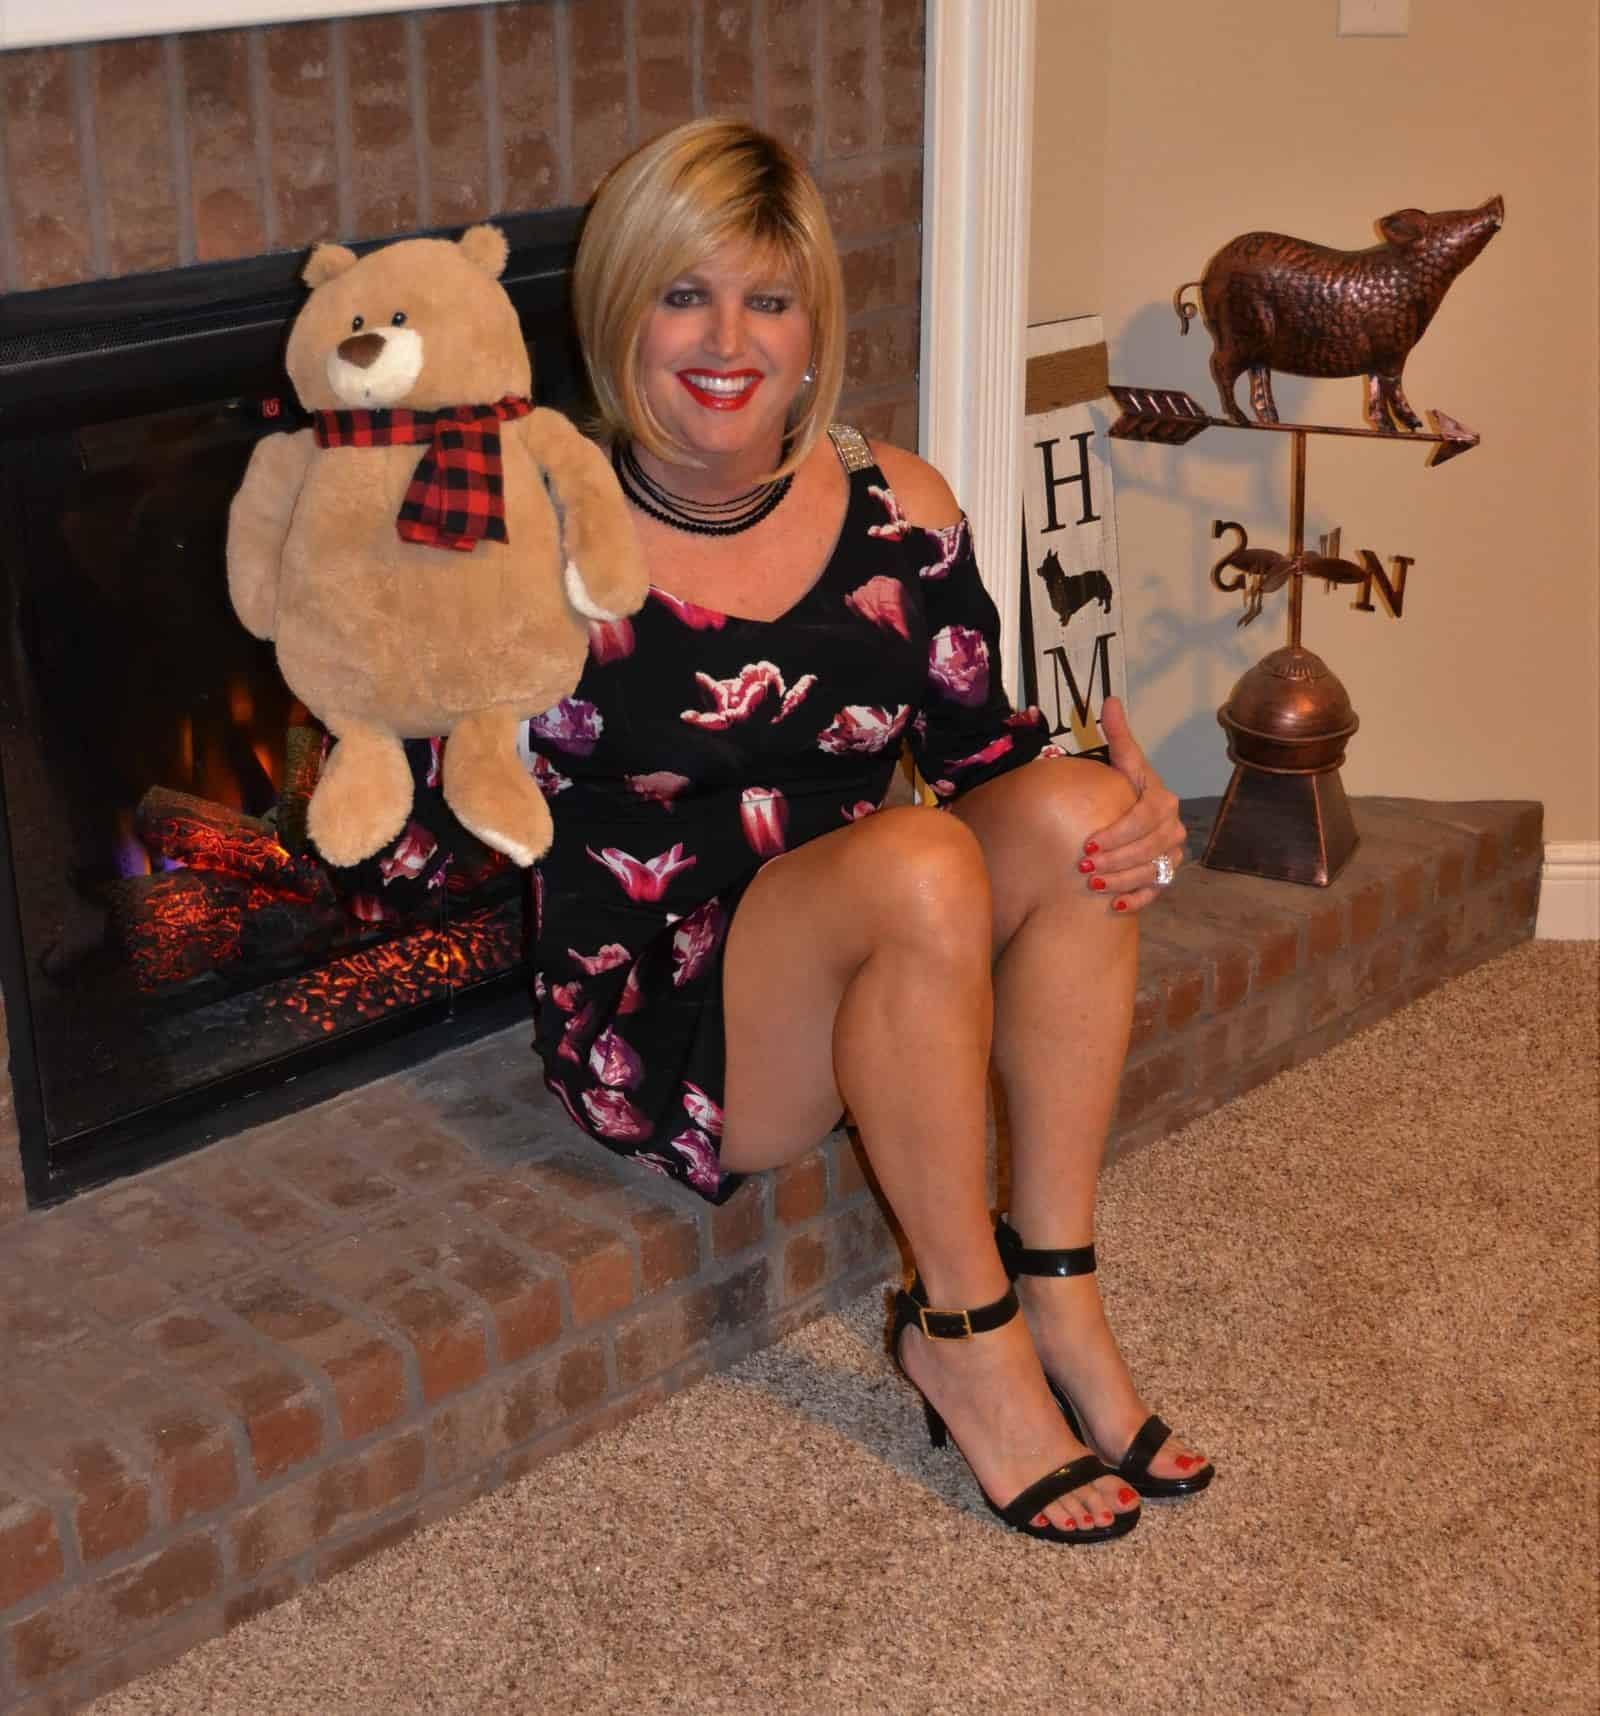 My Clearance Dress And My Teddy!